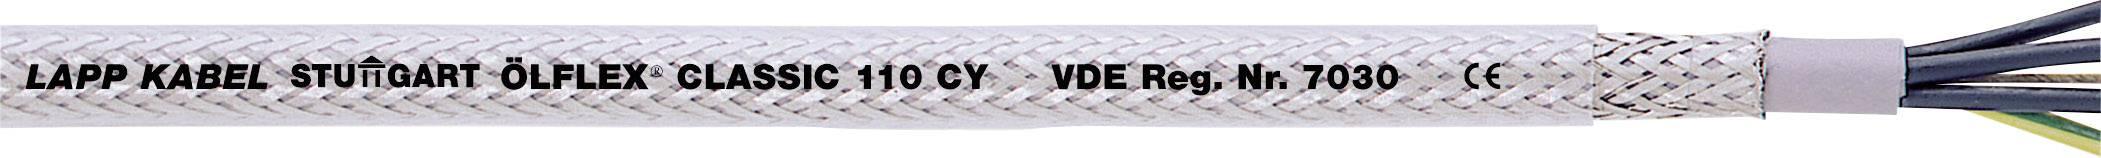 Datový kabel LappKabel Ölflex CLASSIC 110 CY, 3 x 2,5 mm², transparentní, 1 m